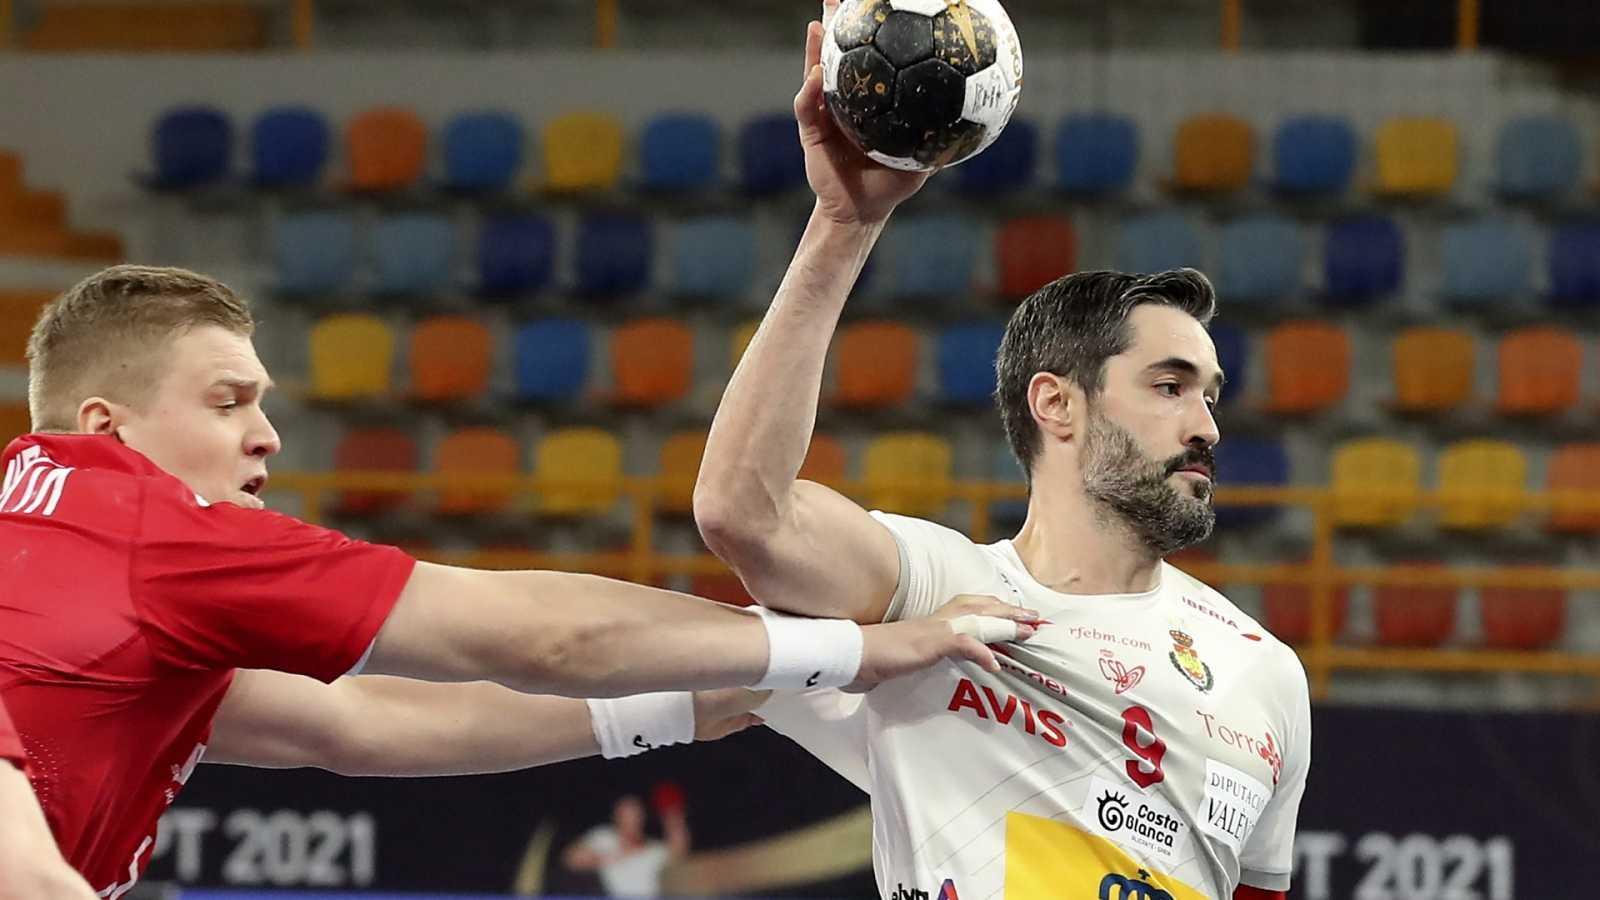 Balonmano - Campeonato del Mundo masculino: Polonia - España - ver ahora